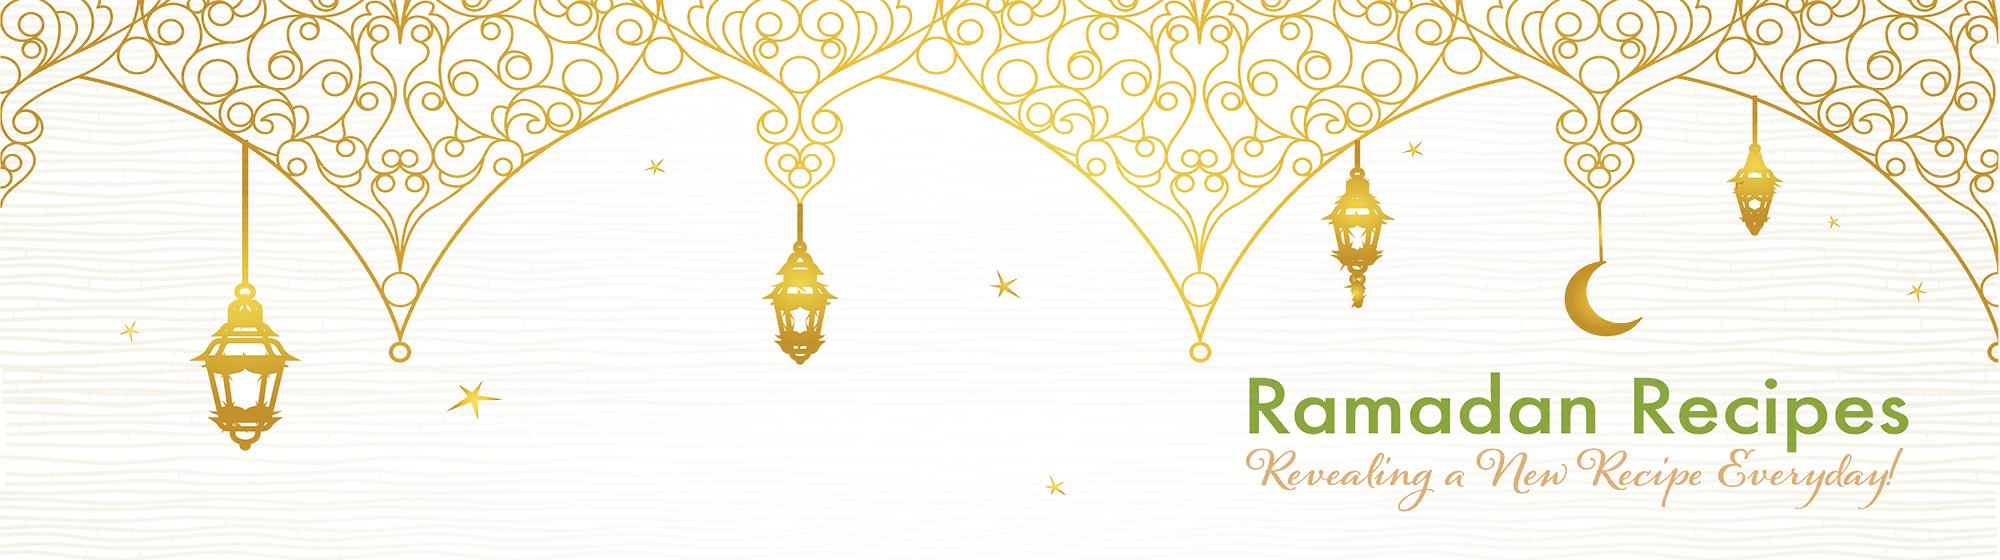 Ramadan-Banner-Final